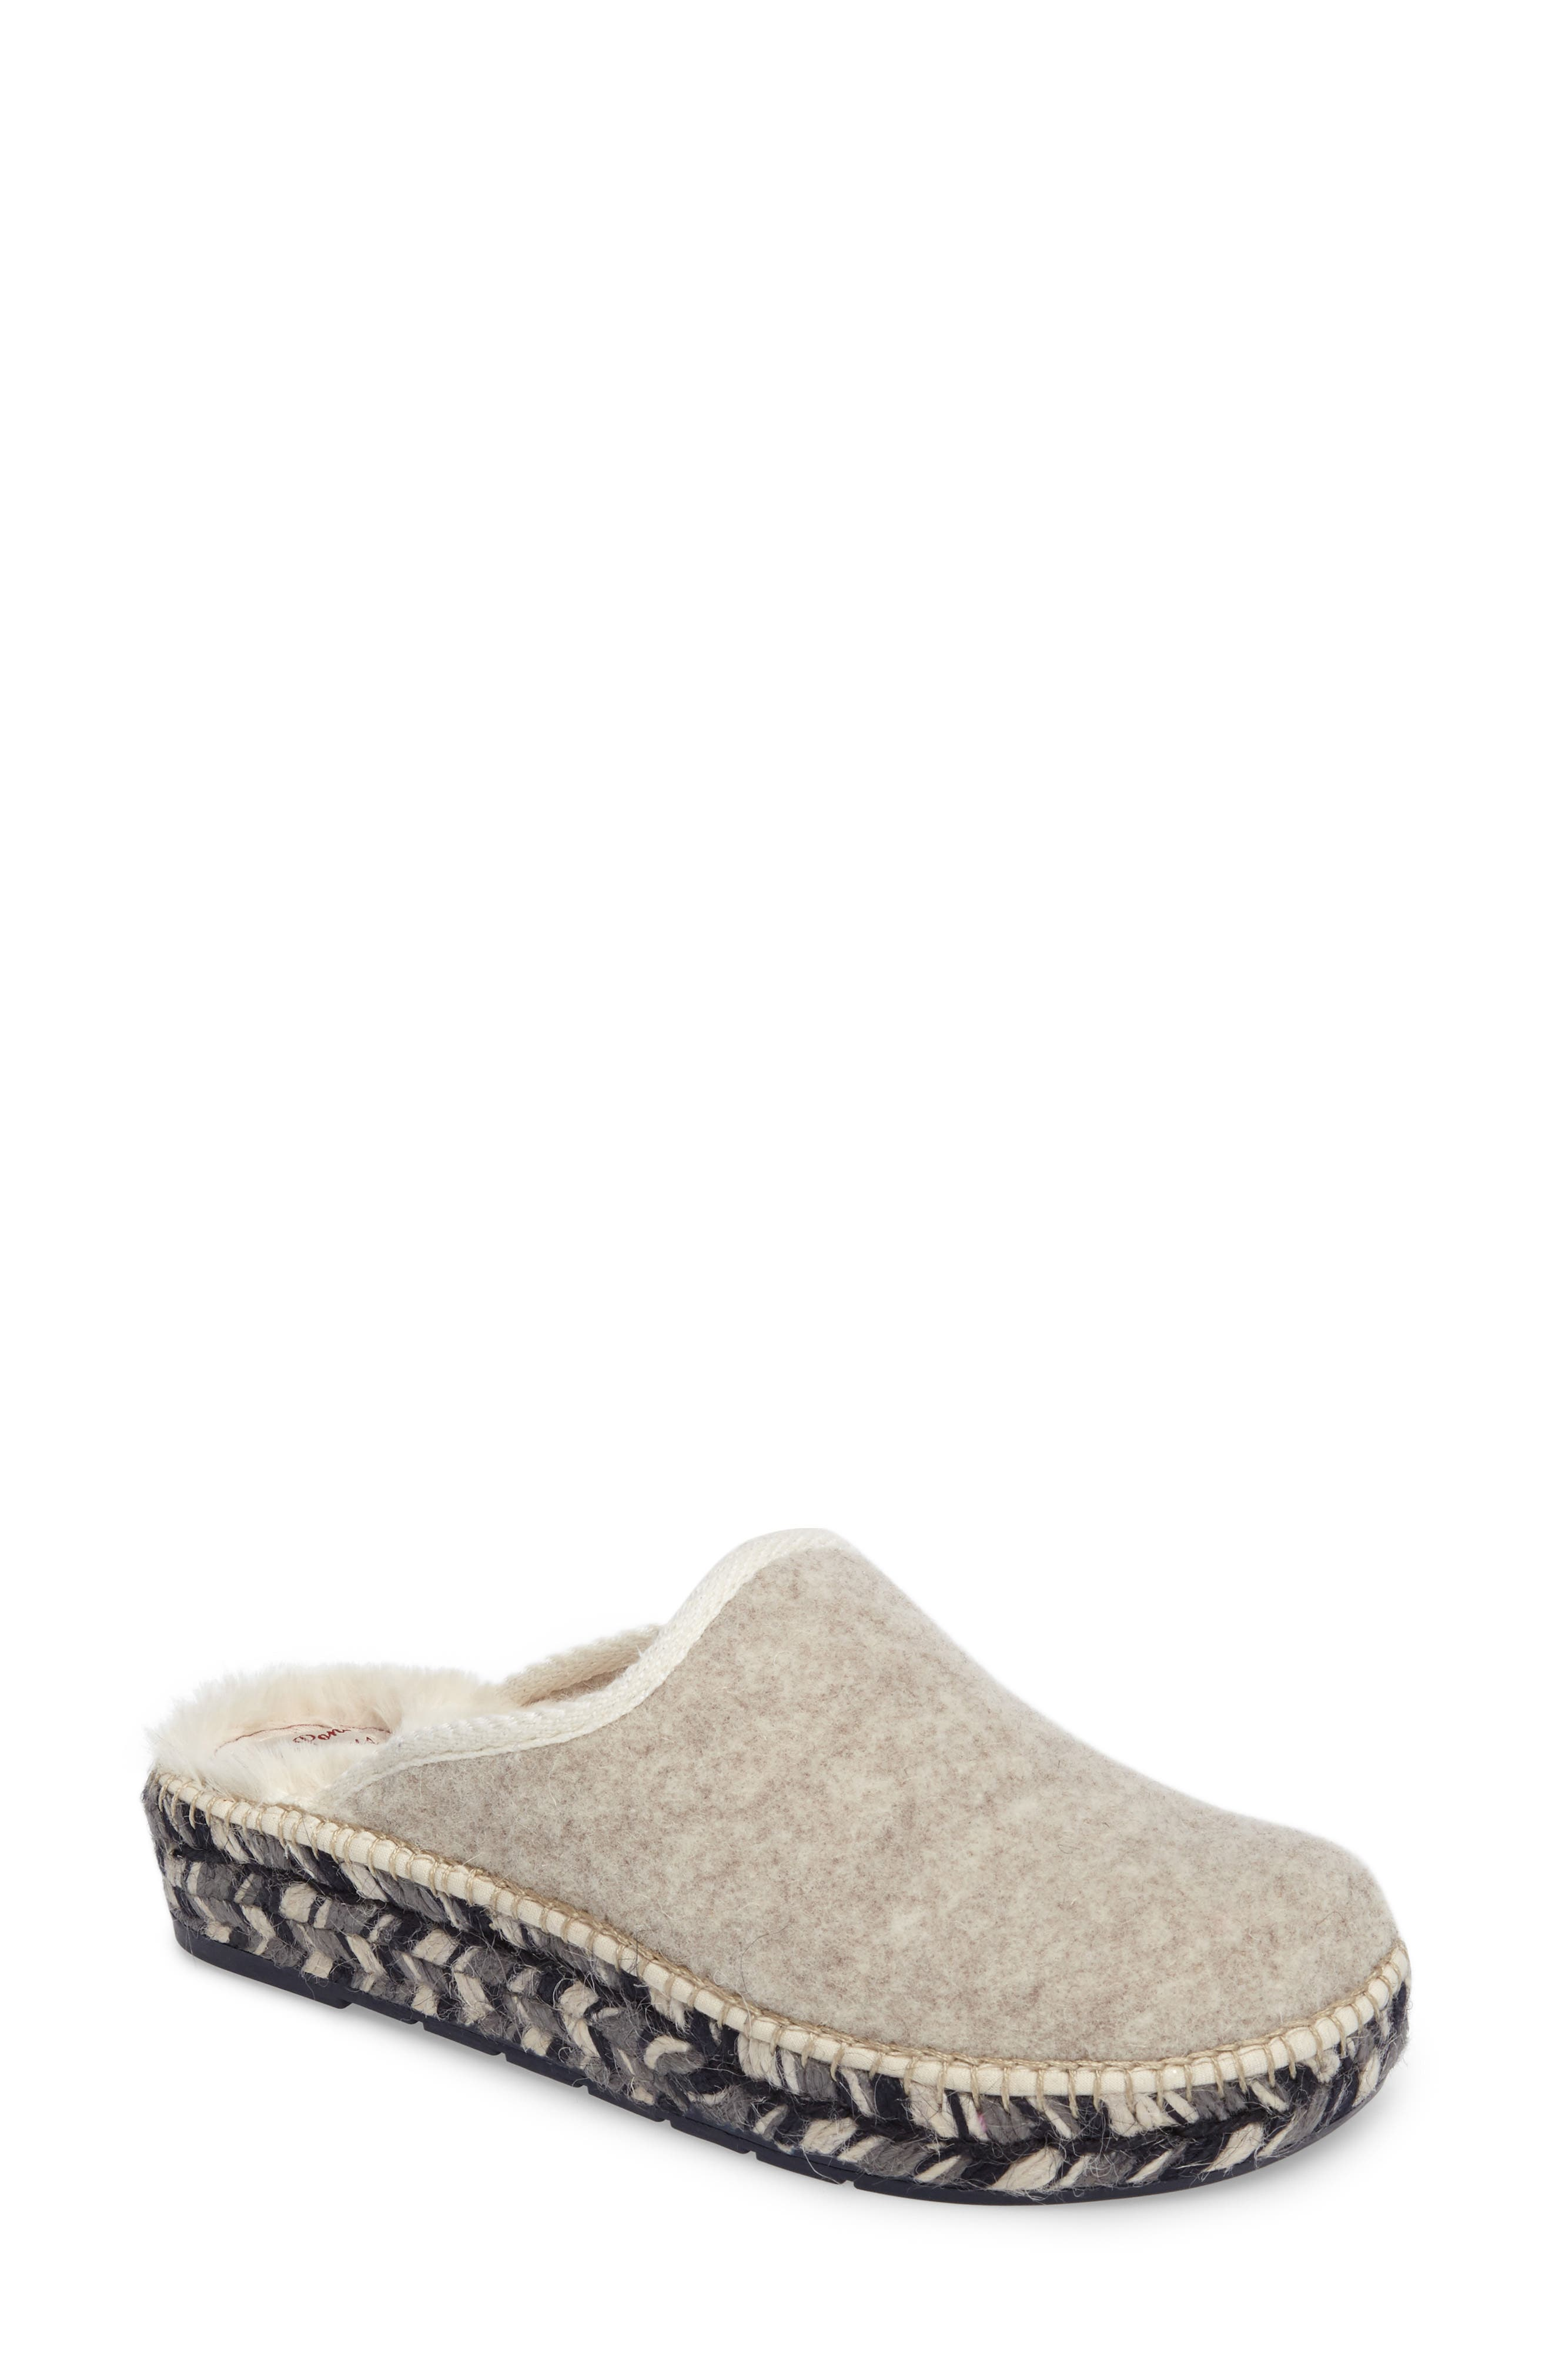 Mysen Faux Fur Lined Espadrille Slipper,                         Main,                         color, Ecru Felt